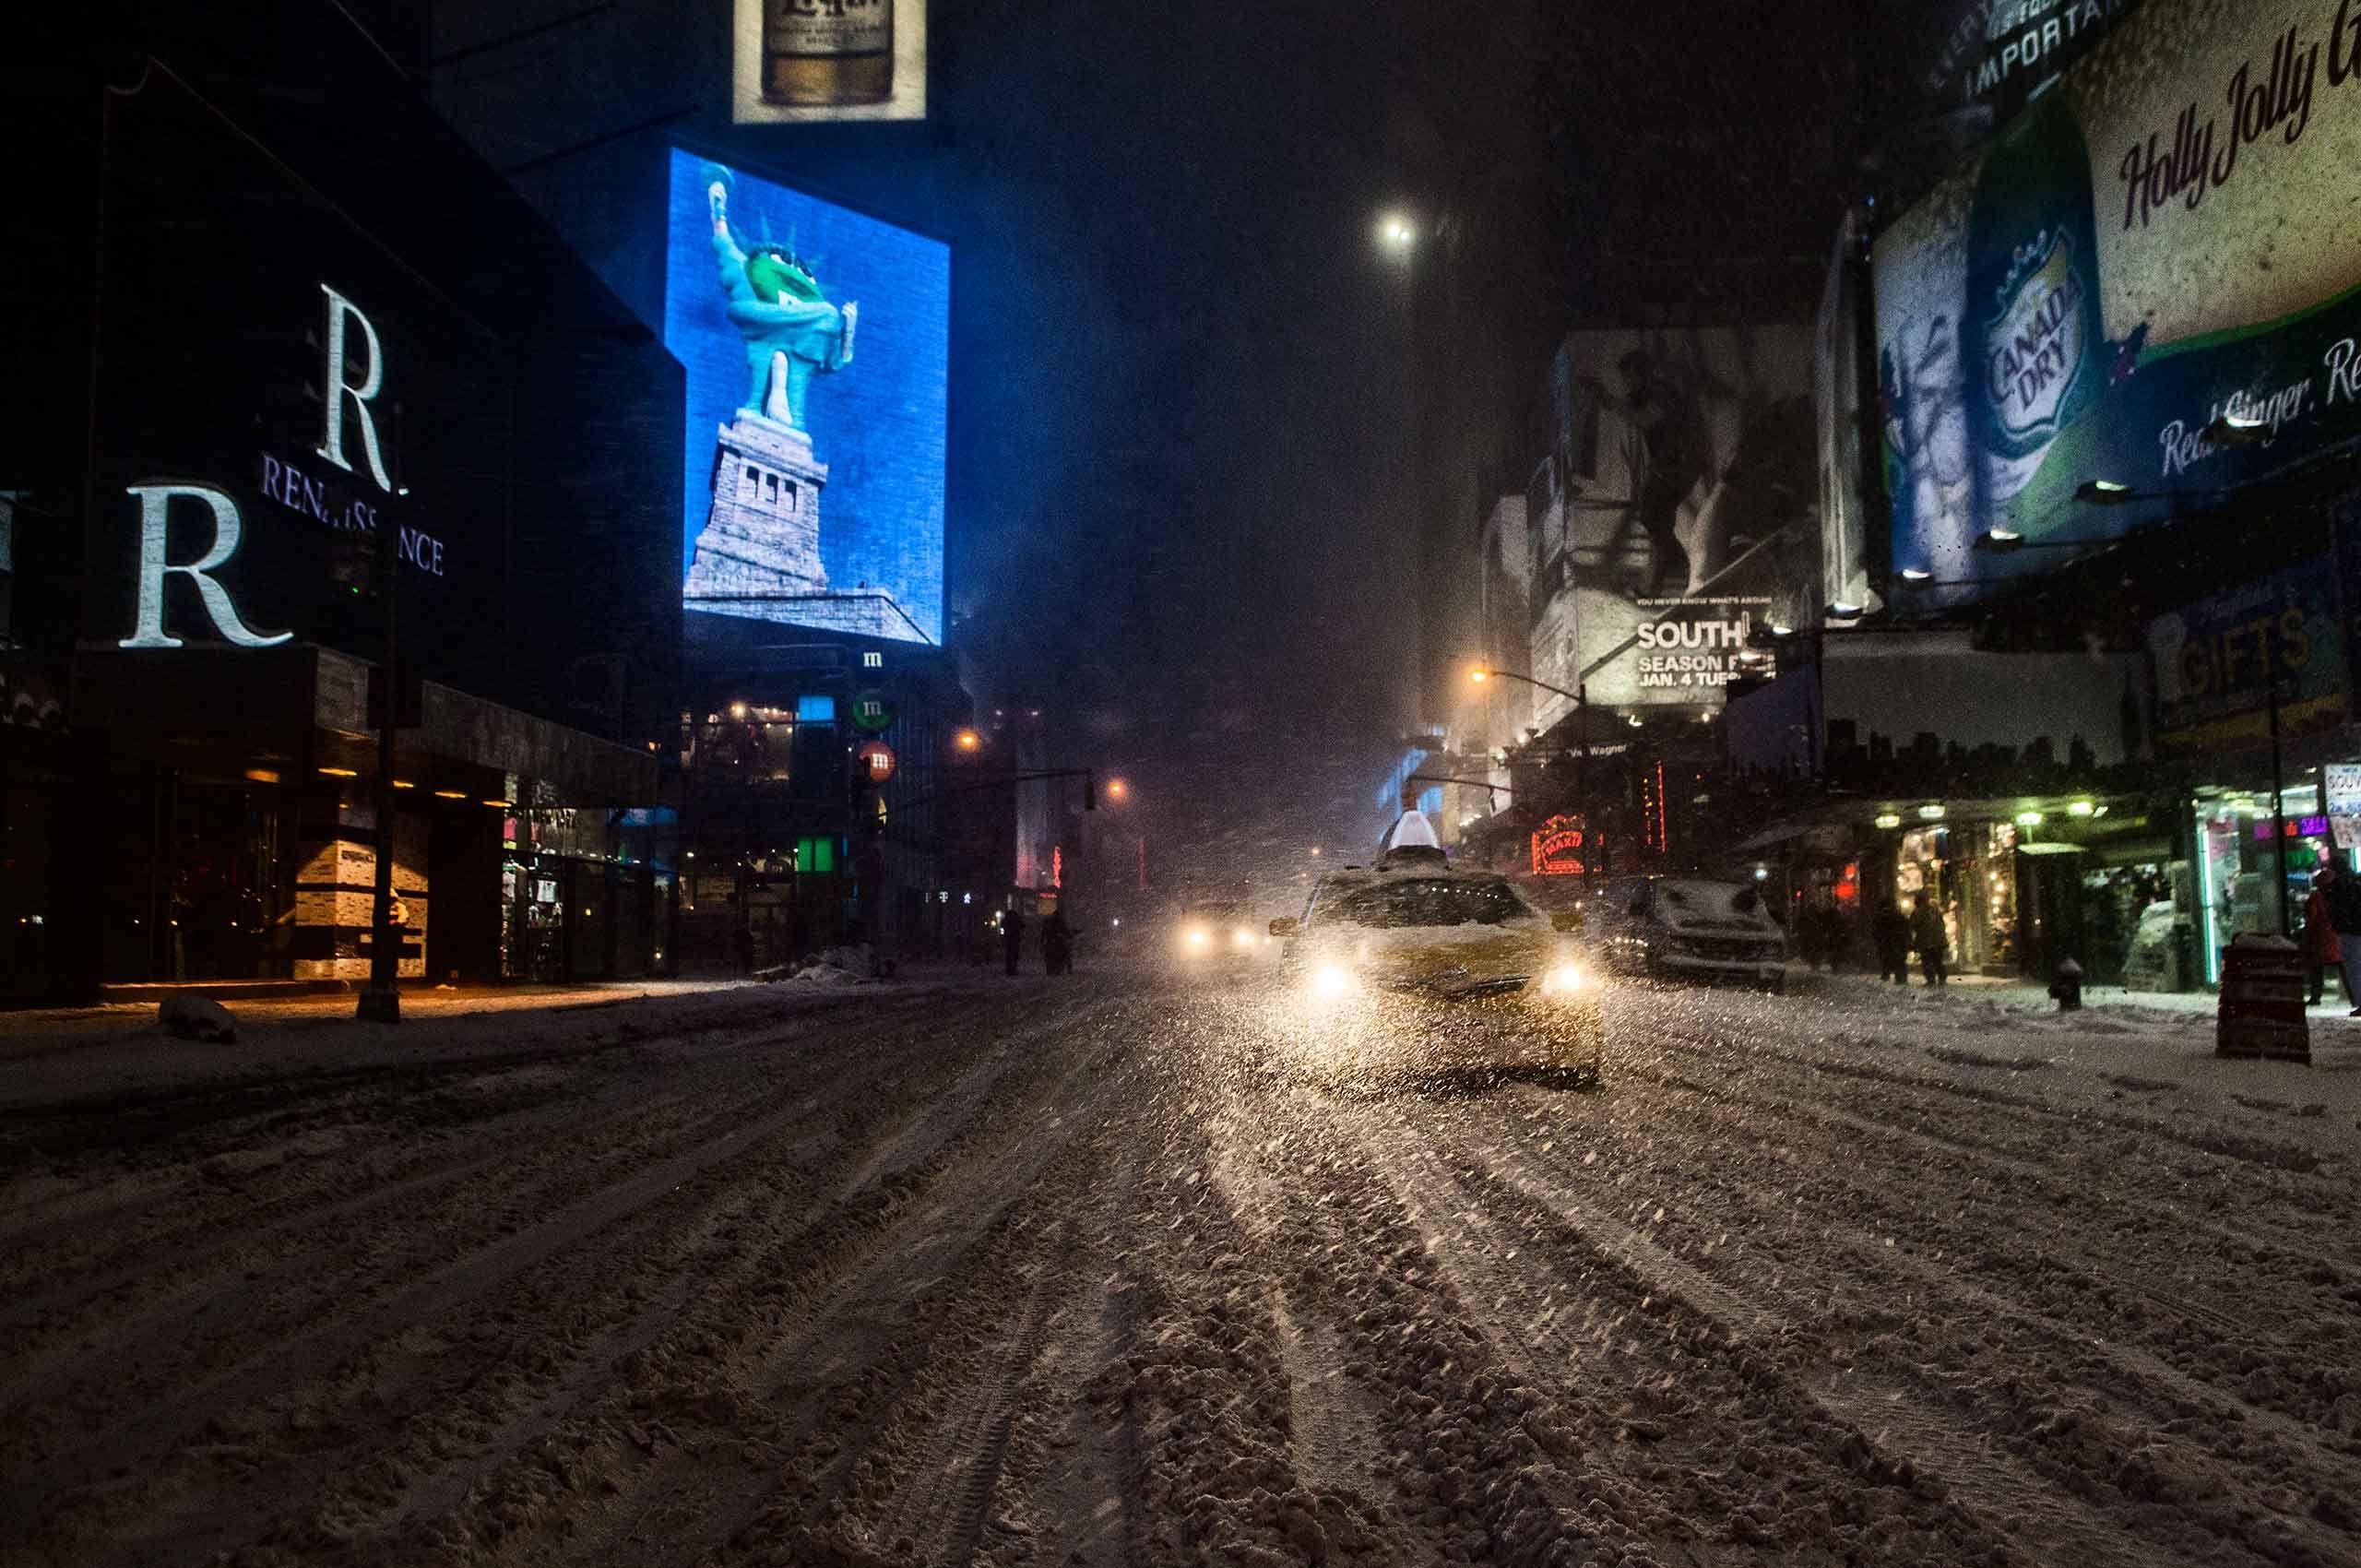 yellowtaxi-snowstorm-by-HenrikOlundPhotography.jpg